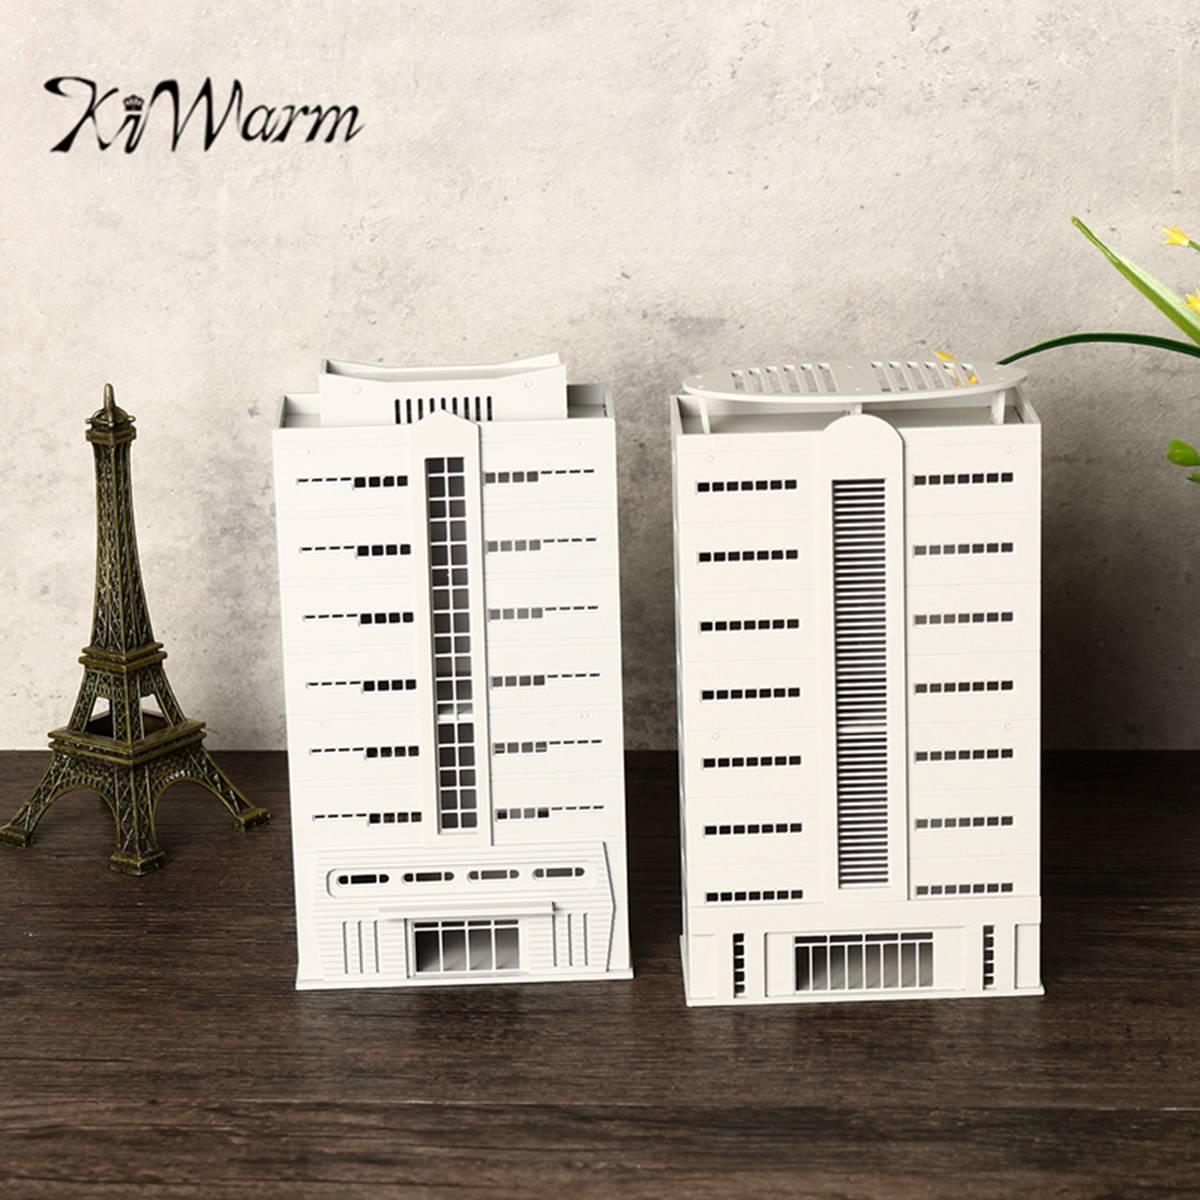 KiWarm Outland Building Model N Scale Gauge 1/144 Scene Modern House Apartment Miniatures Figurines Ornaments Crafts Gift